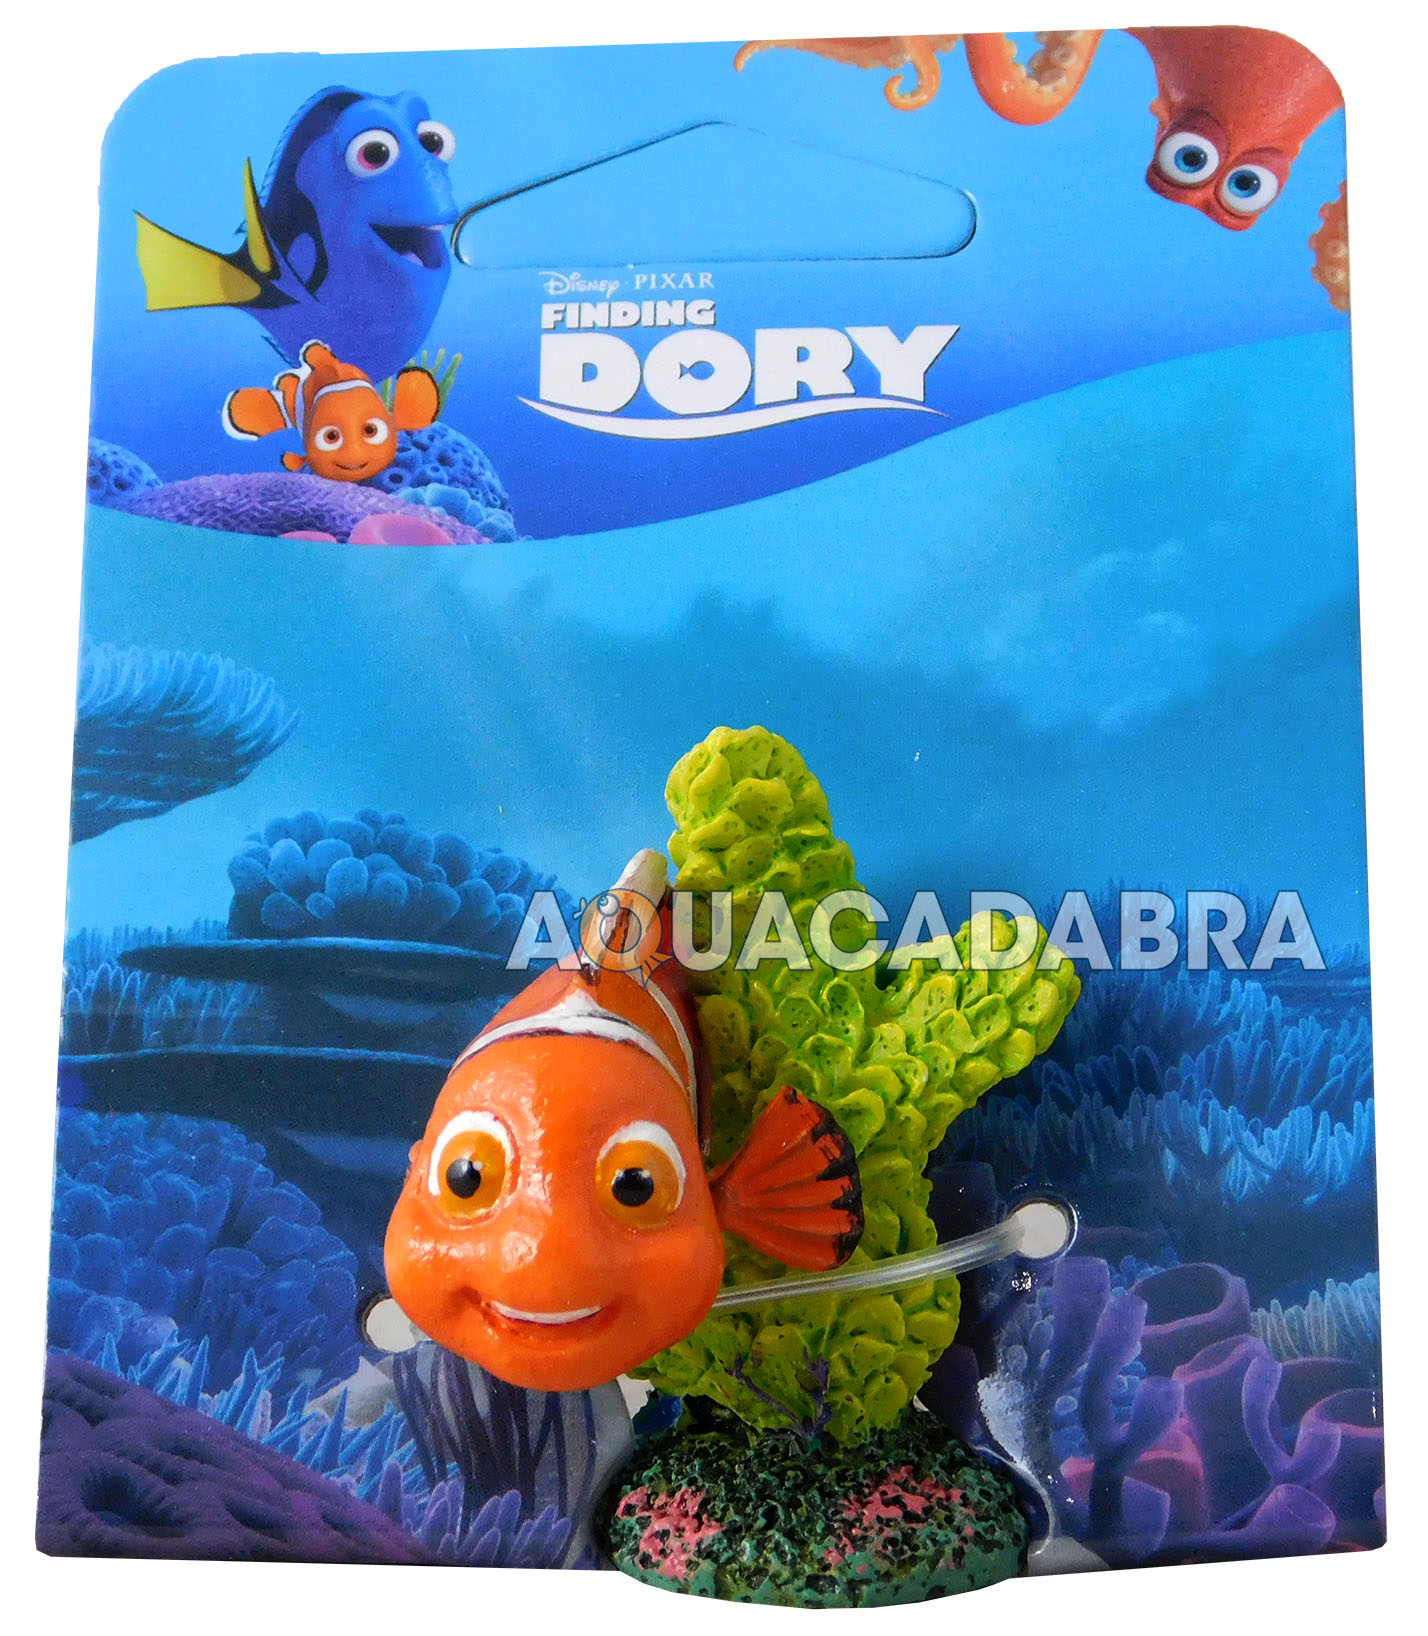 Finding dory nemo aquarium ornaments disney pixar fish for Finding nemo fish